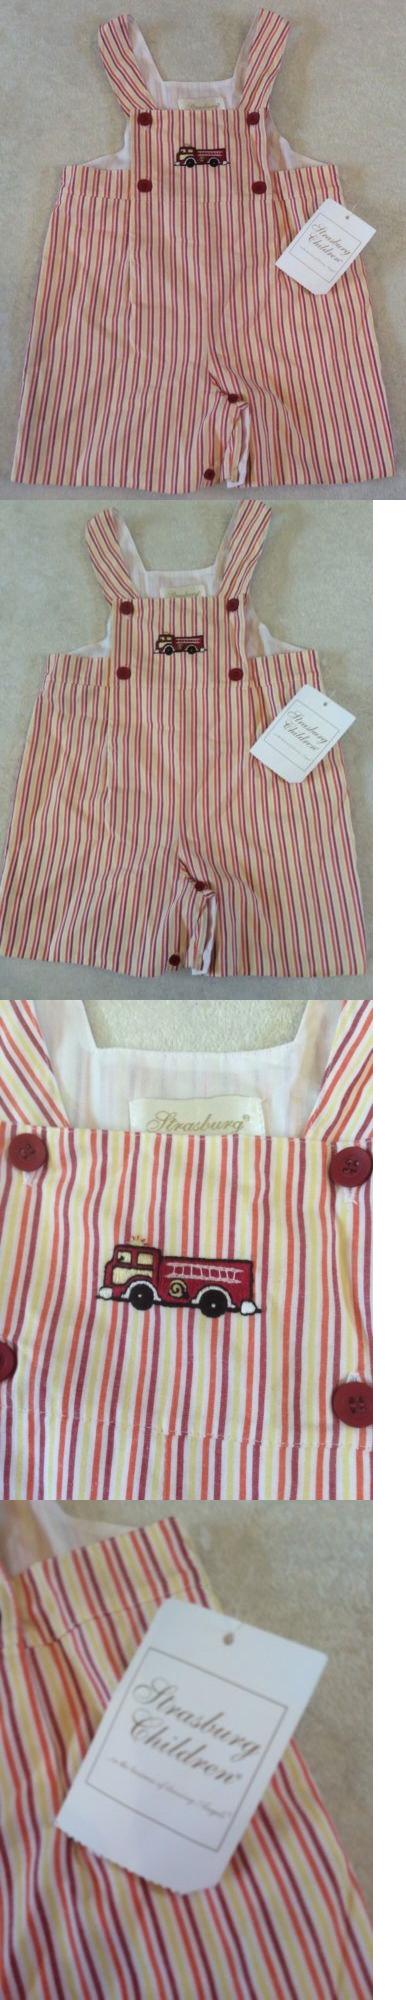 One-Pieces 57784: Strasburg Children Jon-Jon Romper 24 Months Fire Truck Embroidery Striped Nwt -> BUY IT NOW ONLY: $31.66 on eBay!